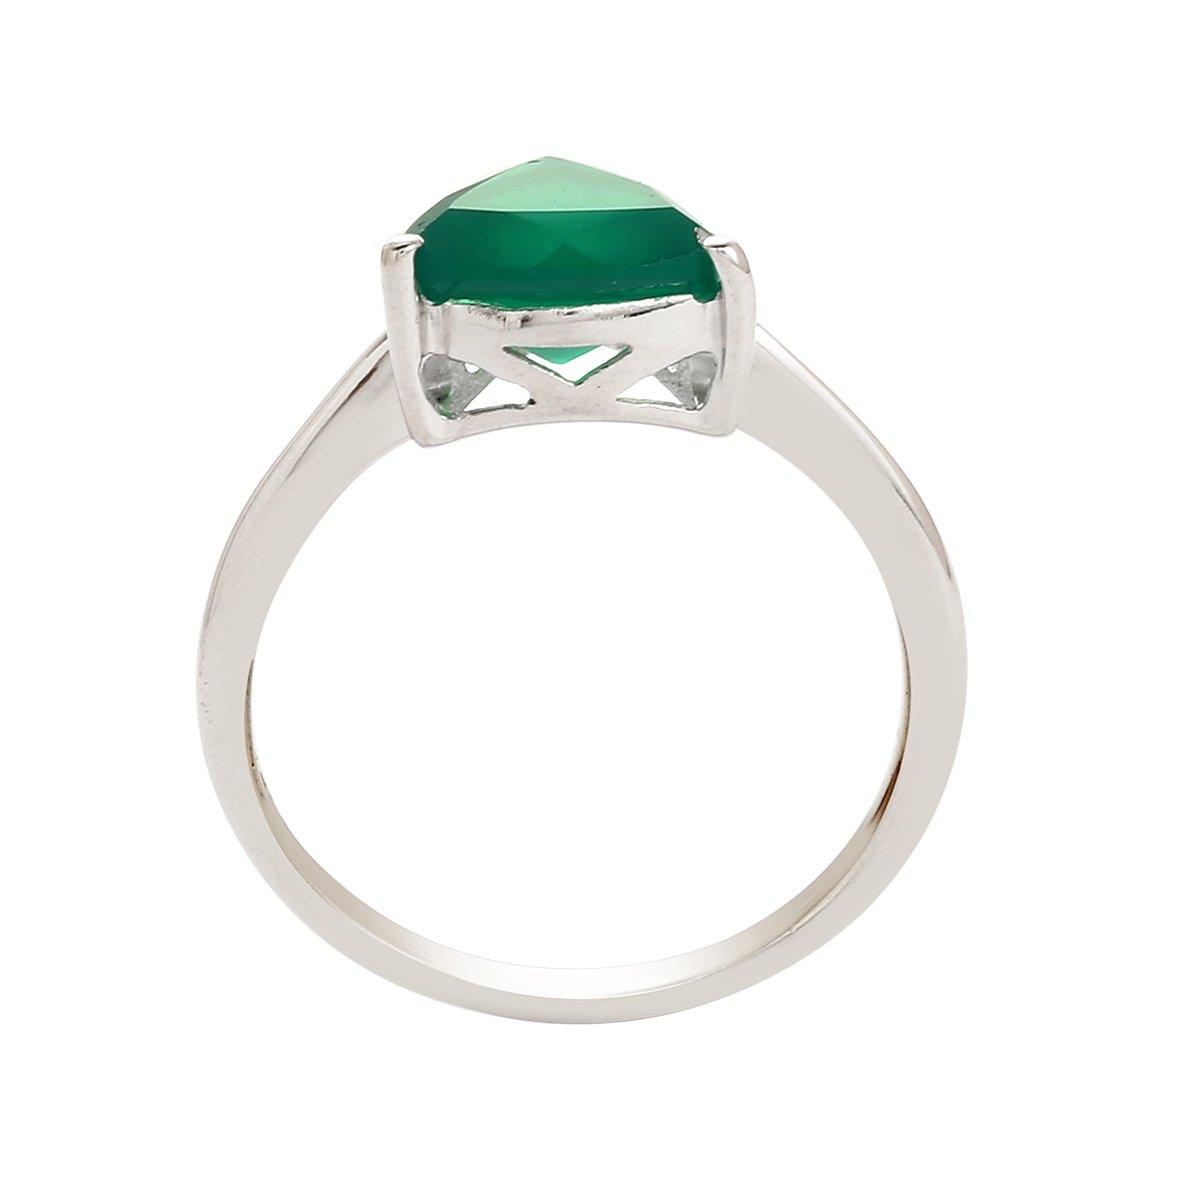 Green Onyx Shining Gemstone 925 Sterling Silver Wedding Ring Jewelry